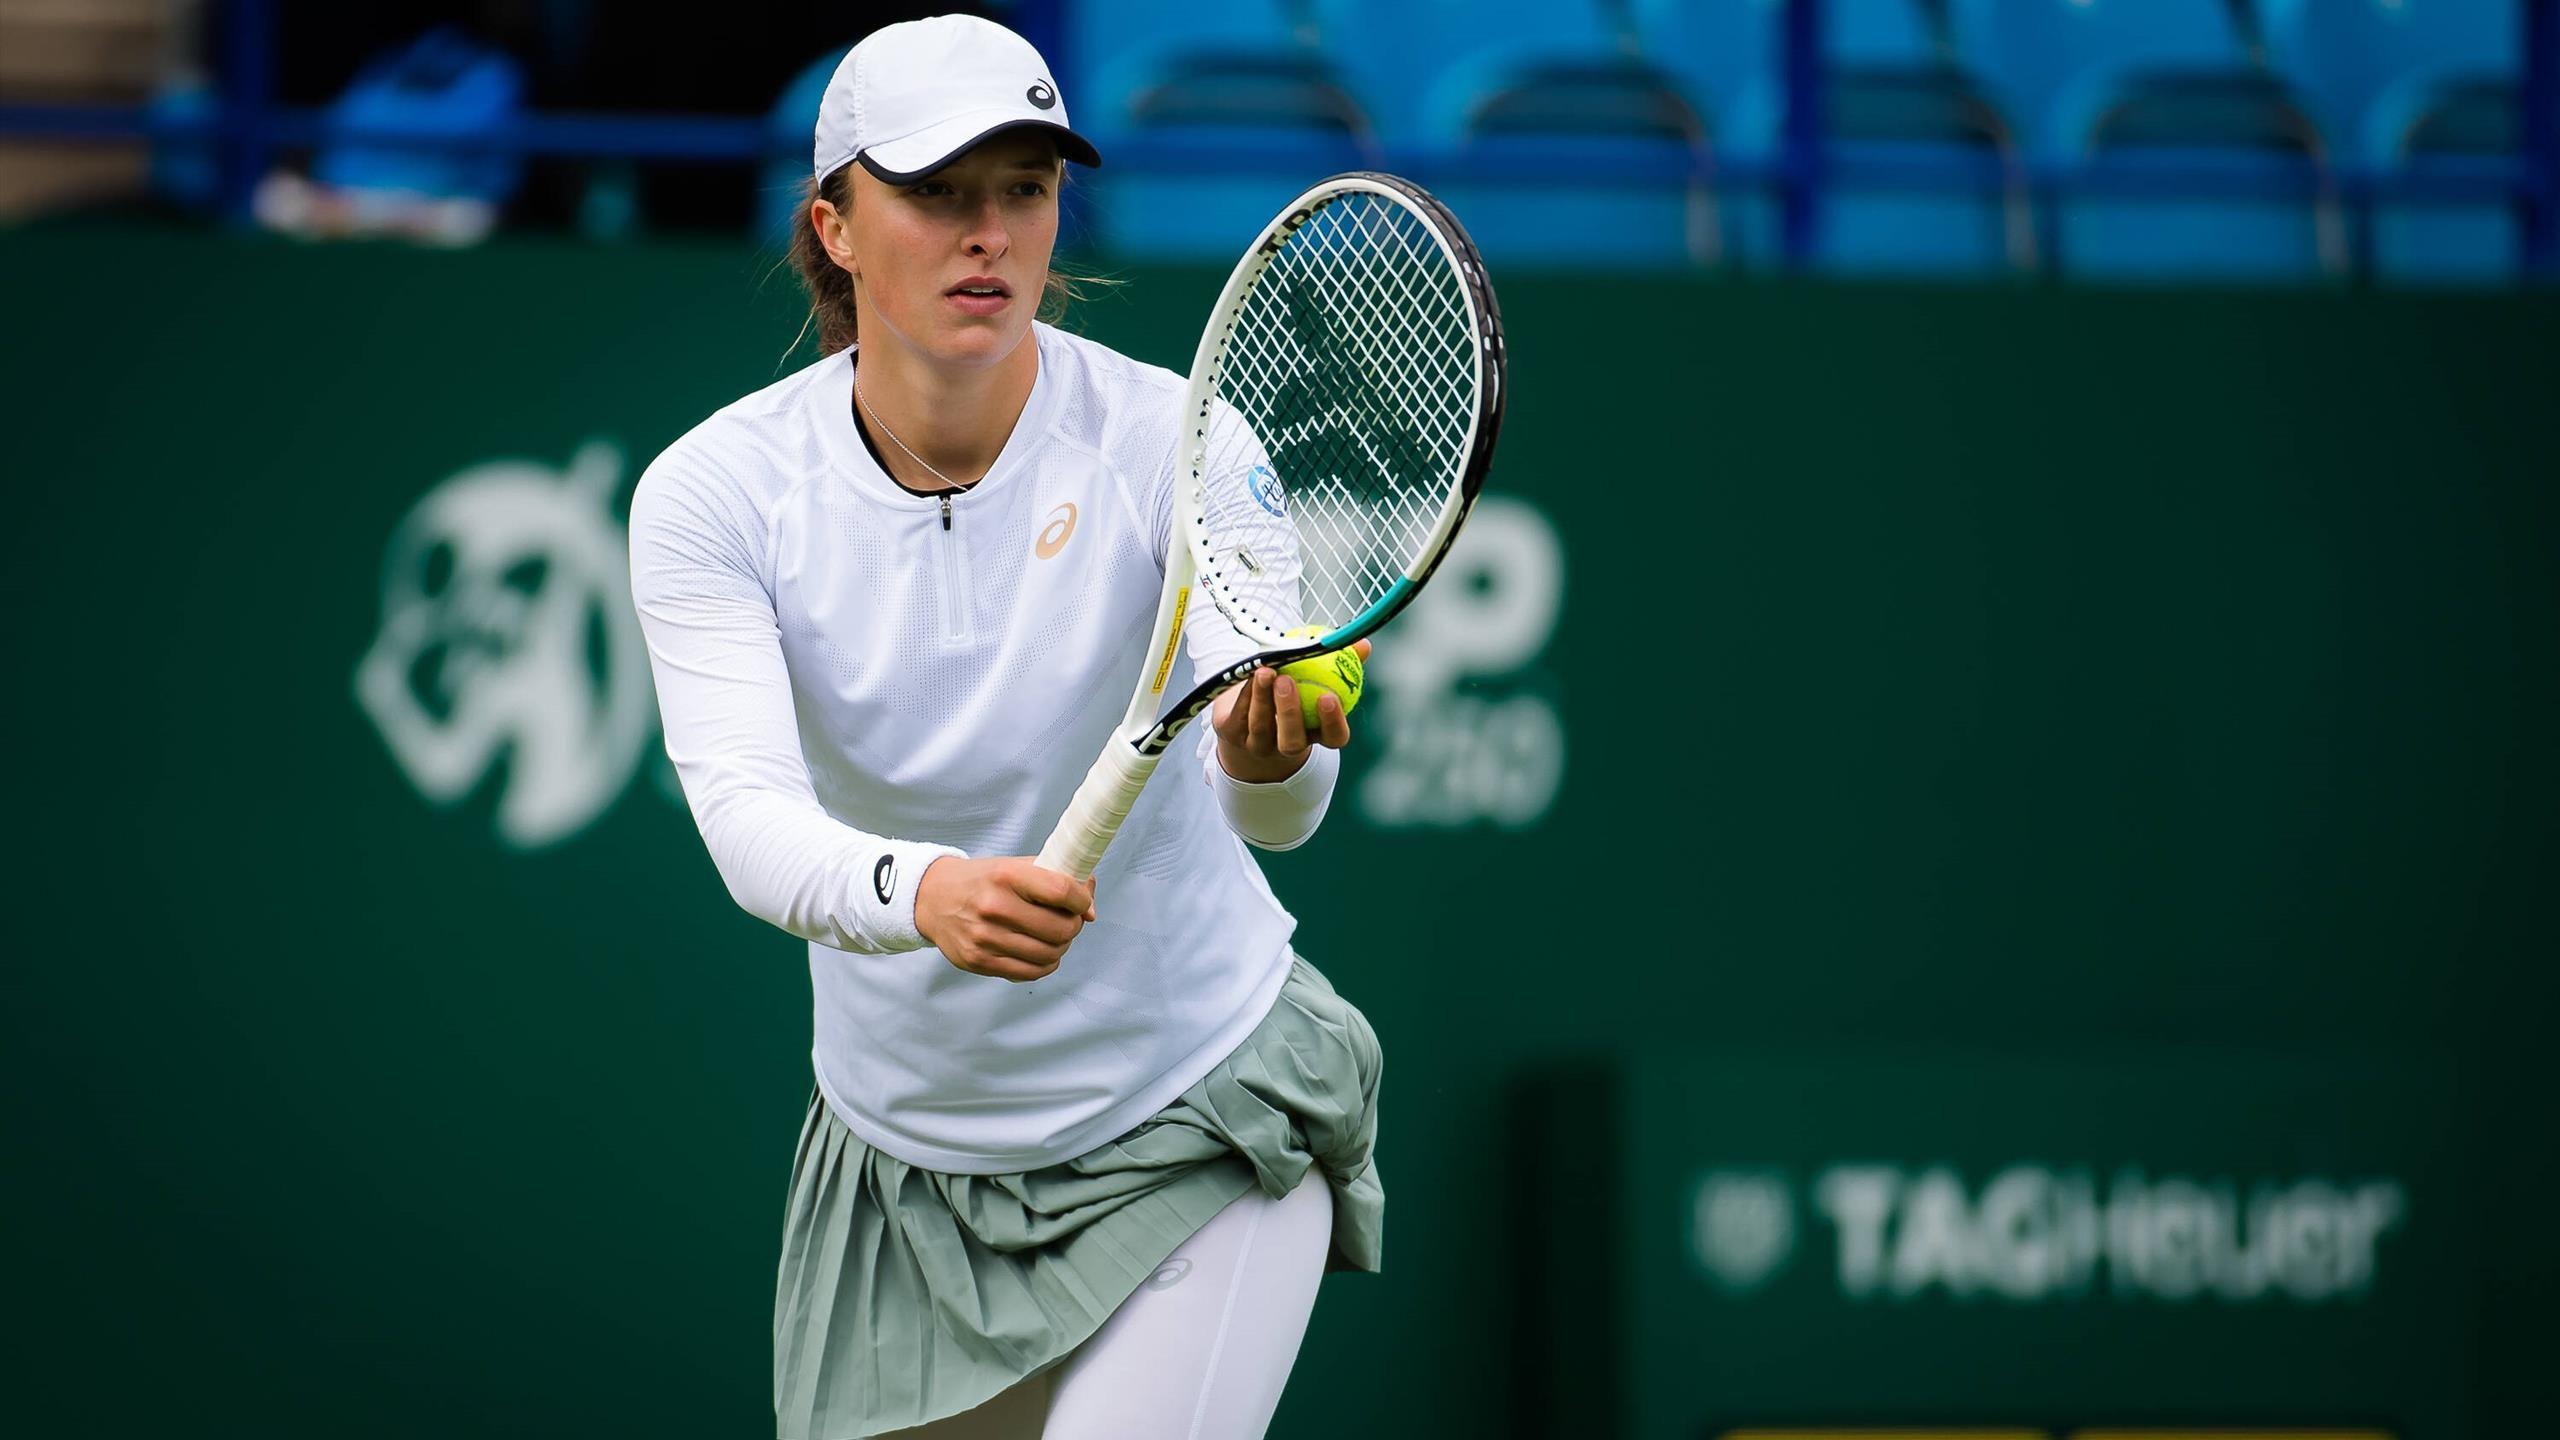 Wimbledon Championships 2021: Iga Swiatek vs. Irina-Camelia Begu Tennis Pick and Prediction